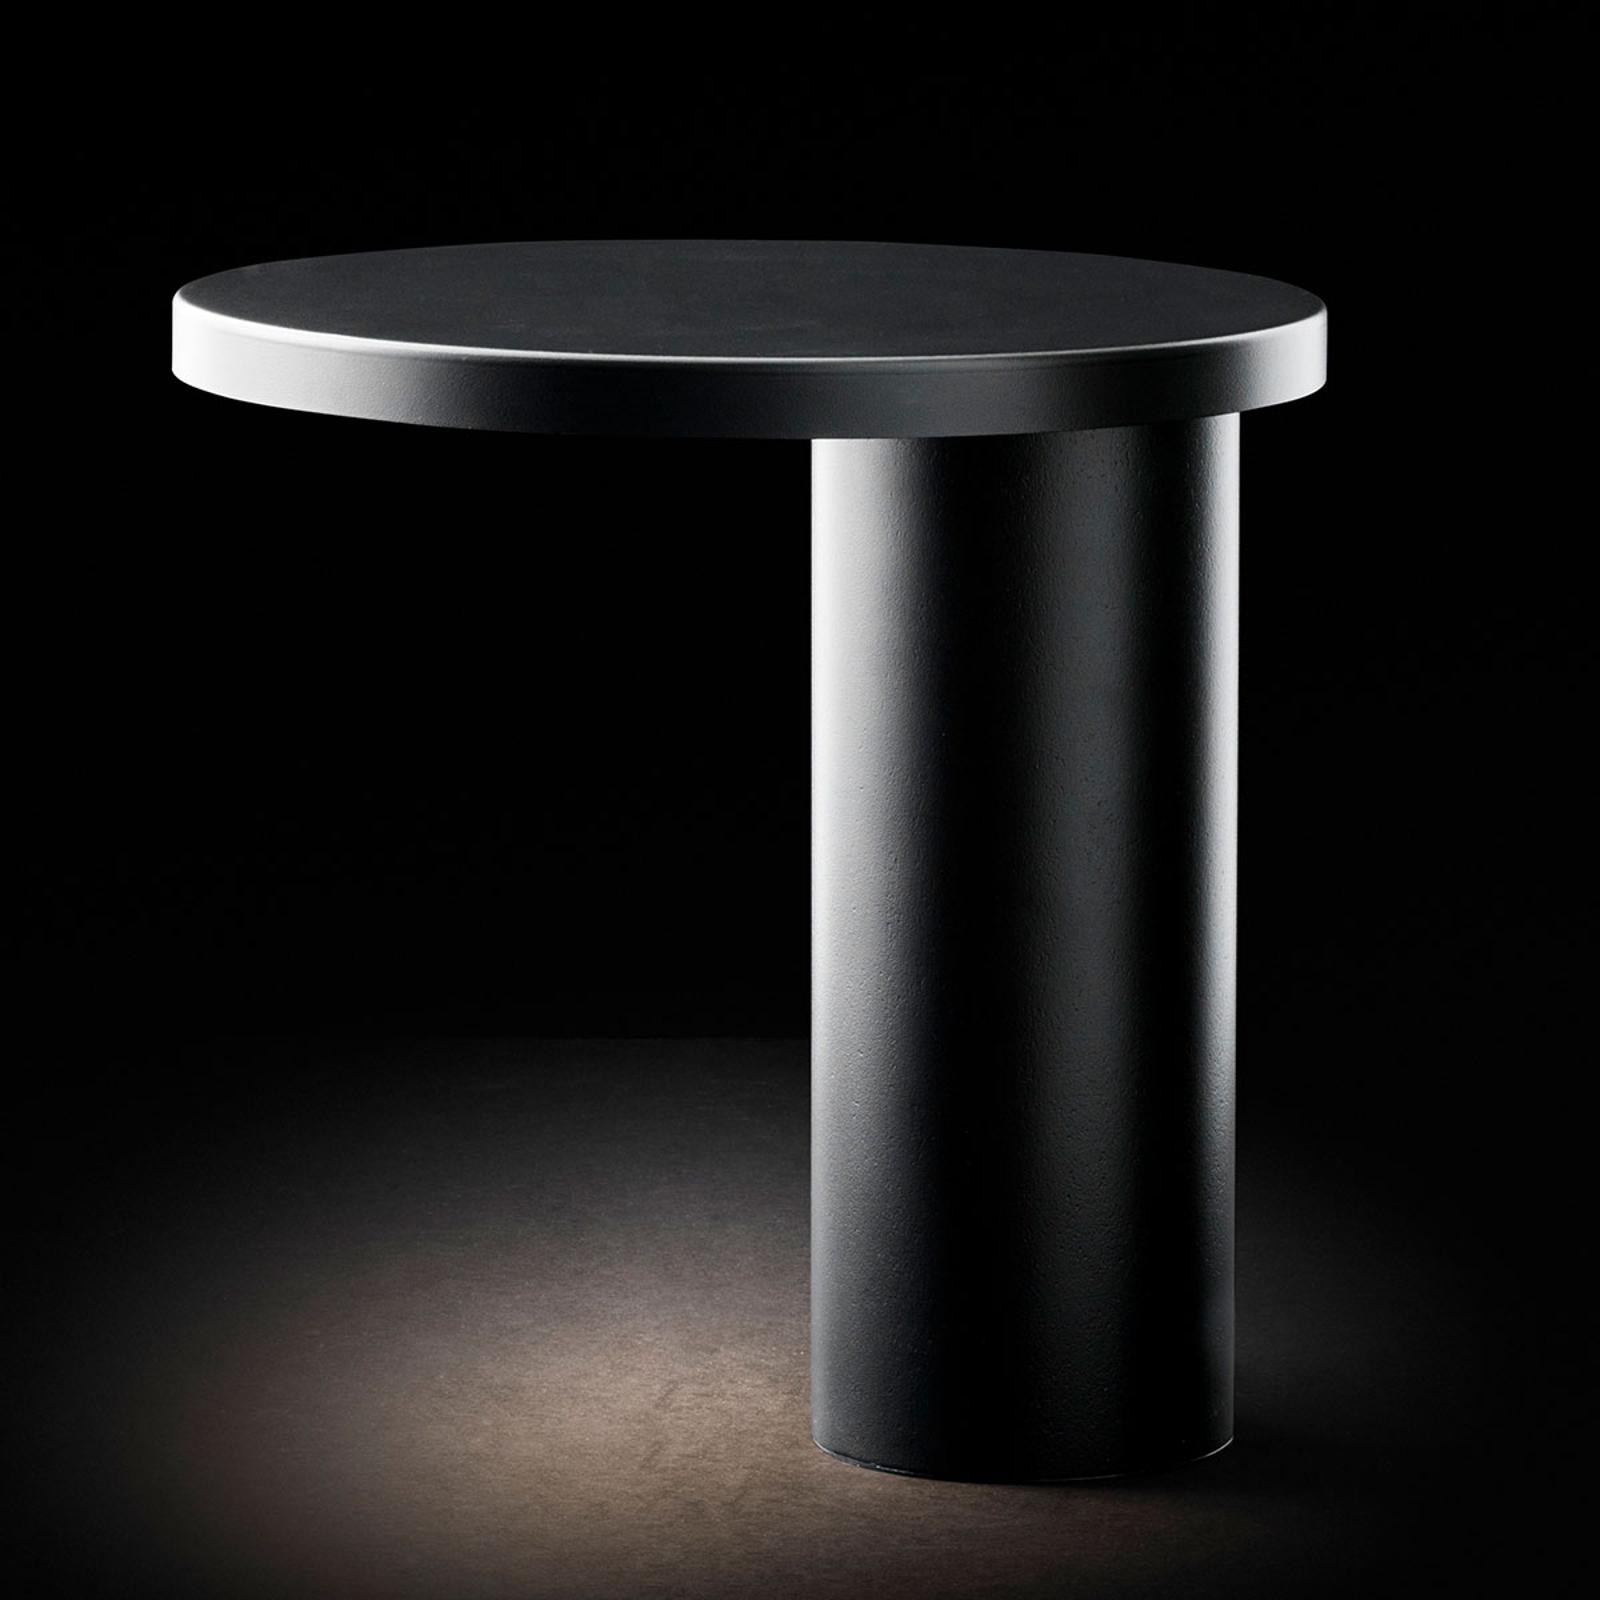 Oluce Cylinda LED-Tischleuchte schwarz